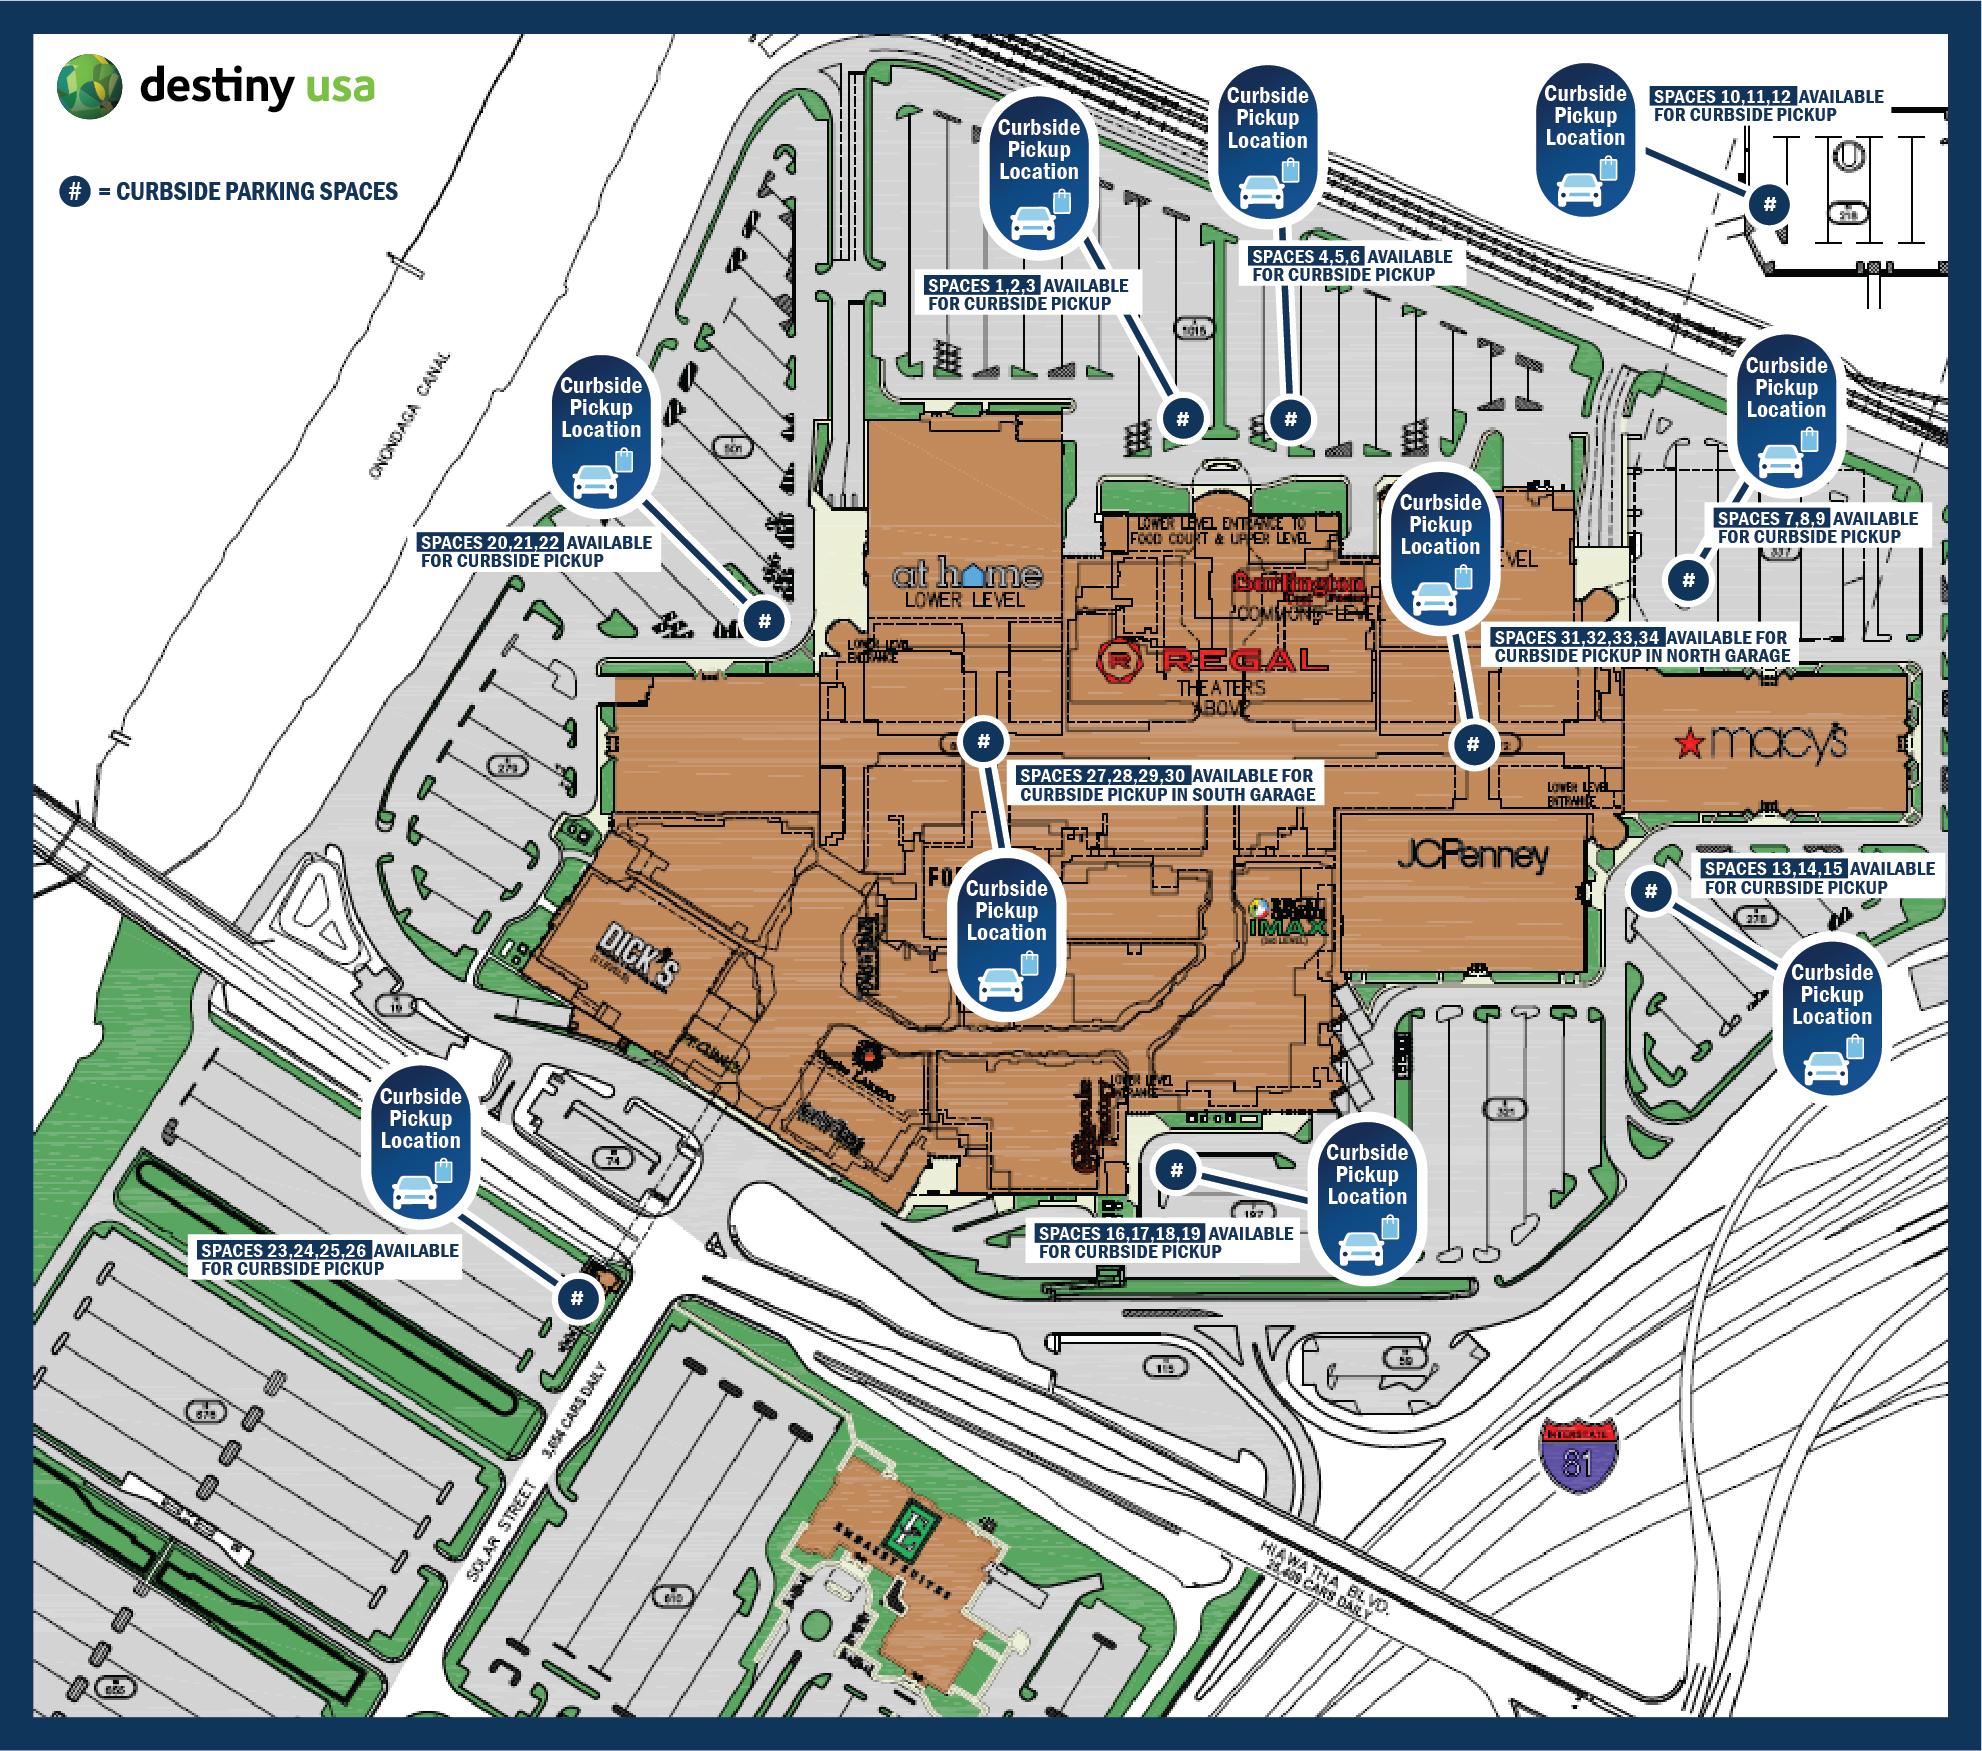 Destiny USA Curbside Pickup Map